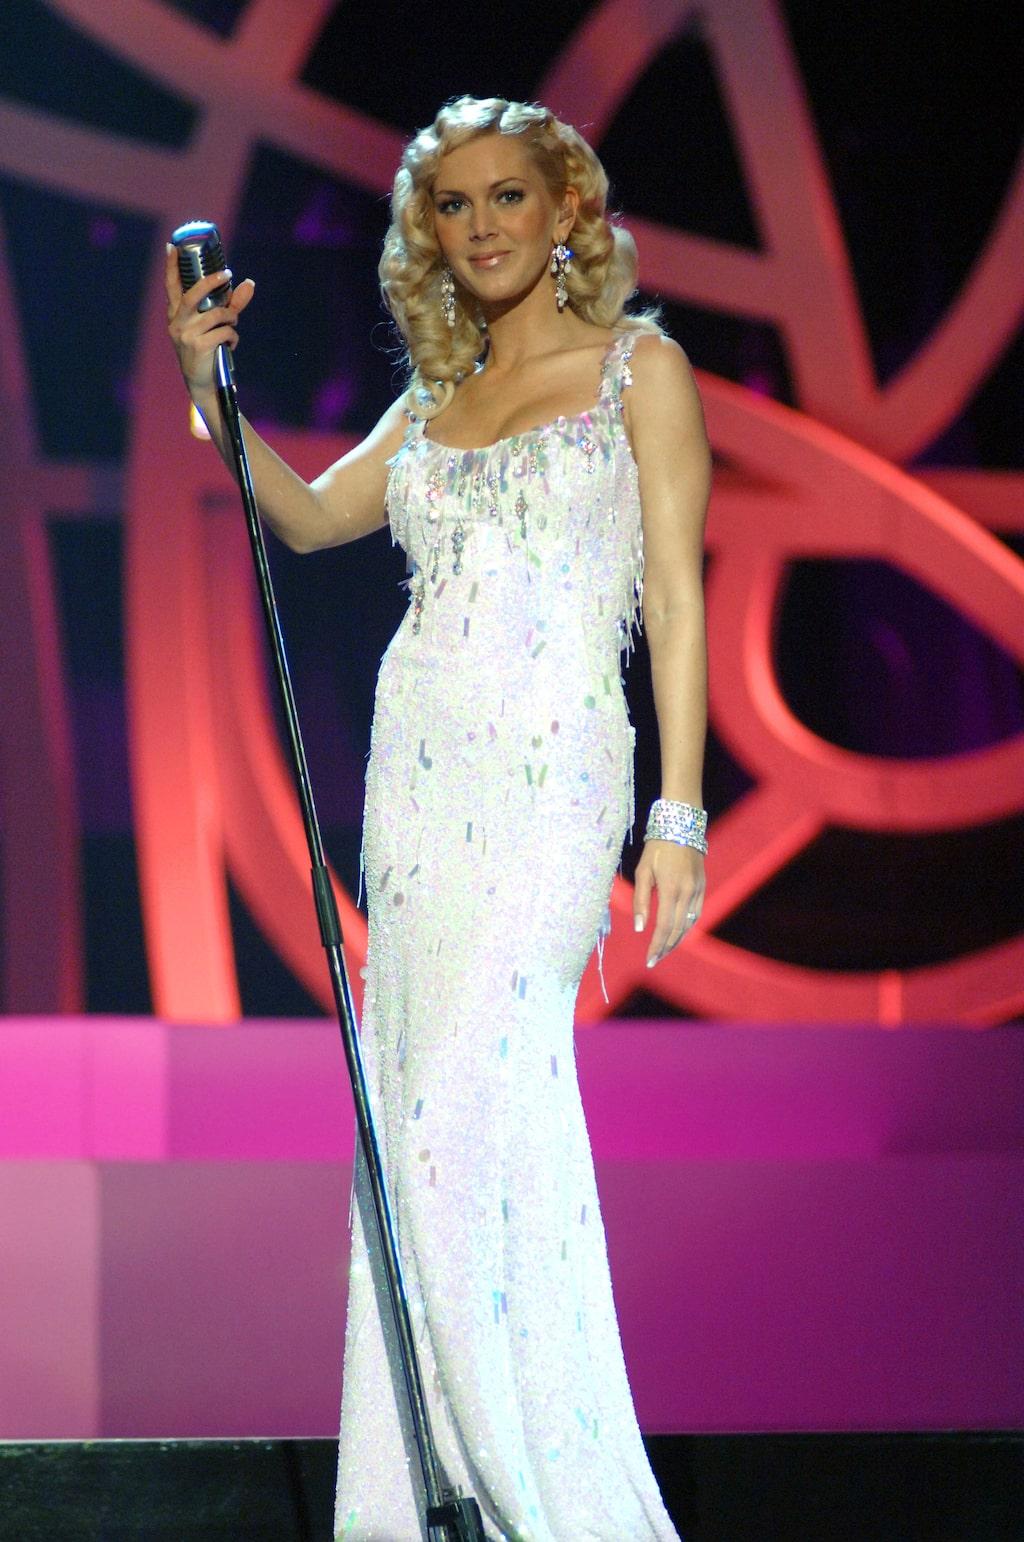 Hannah Graaf, Melodifestivalen, 2006